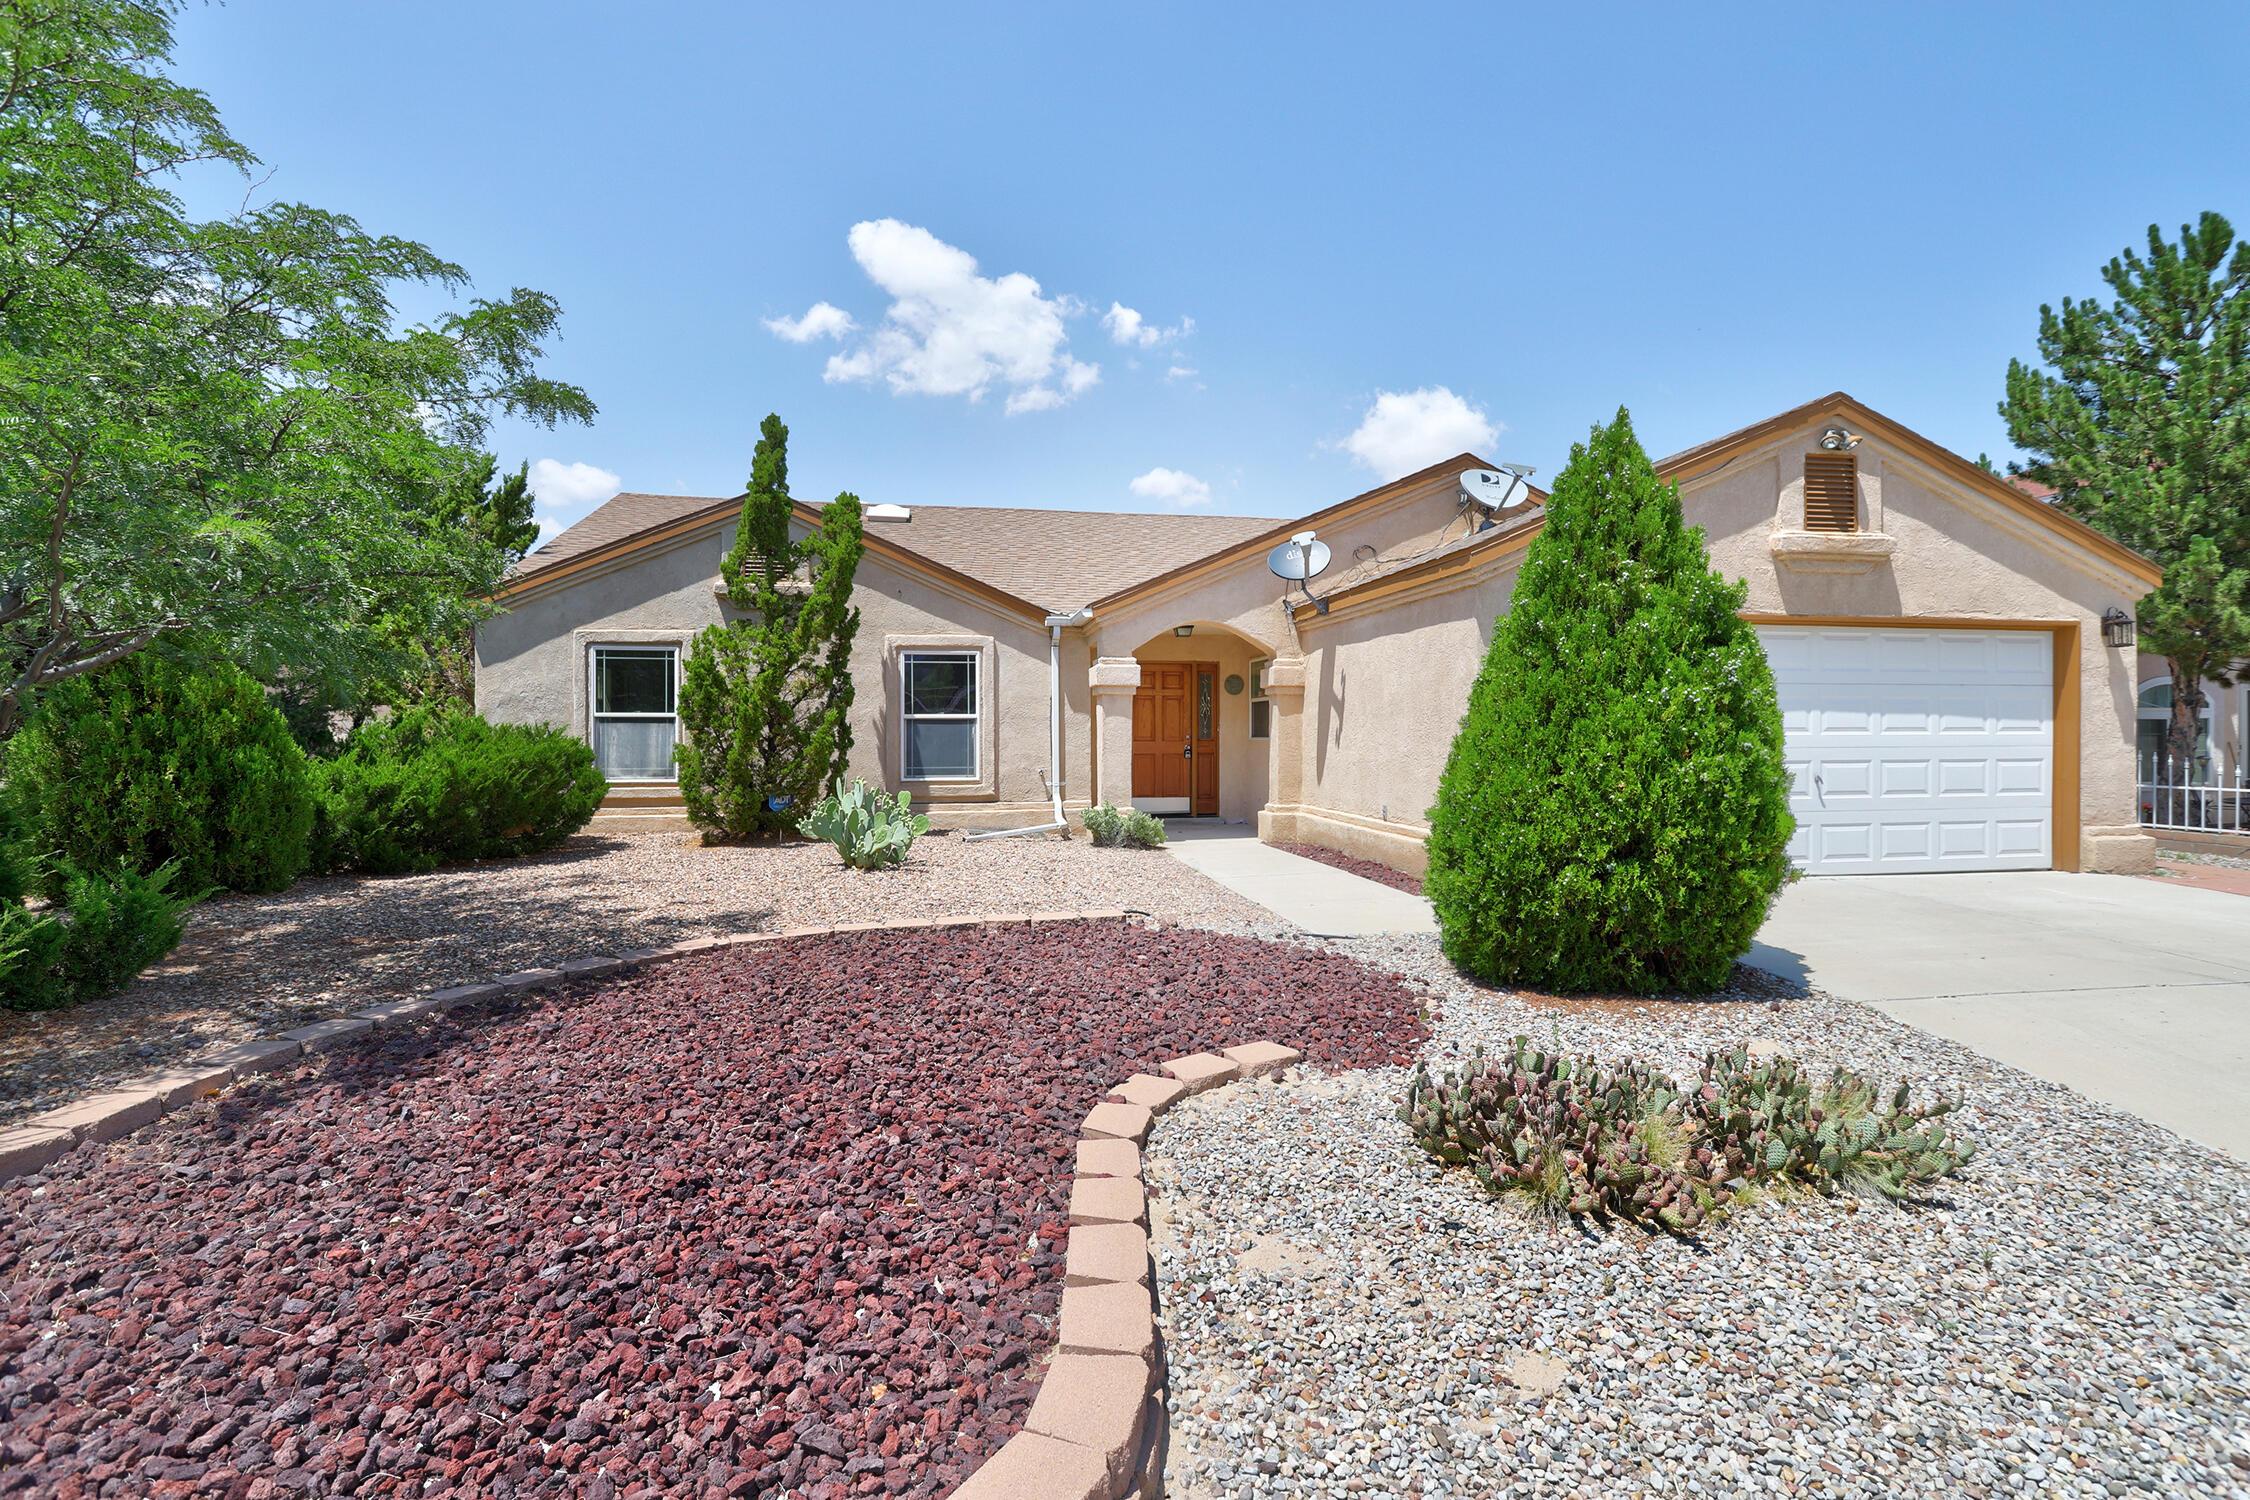 4415 ASPEN GLADE Drive, Albuquerque NM 87114